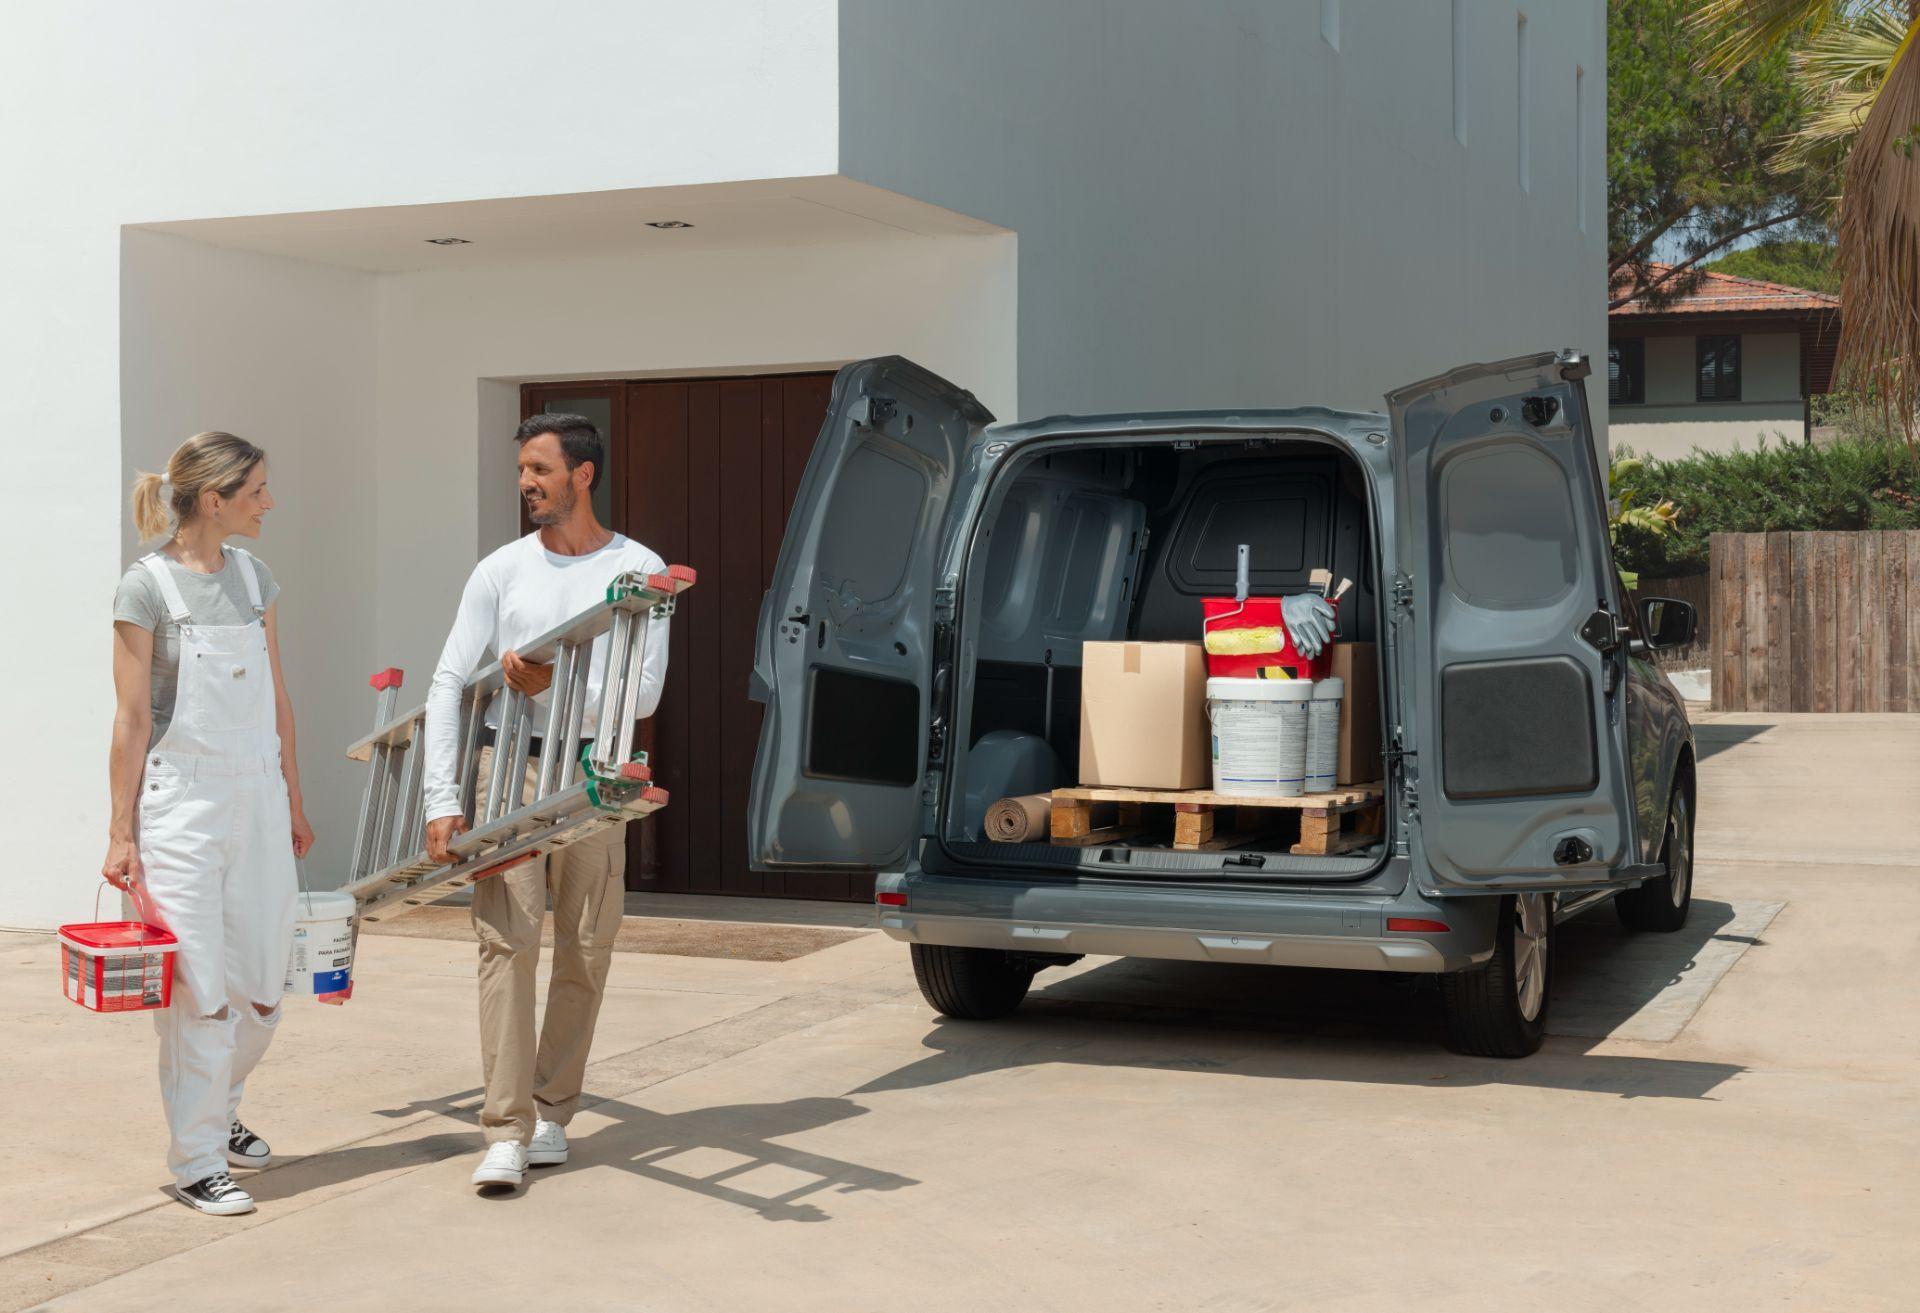 2022-Nissan-Townstar-petrol-van-dynamic-13-1